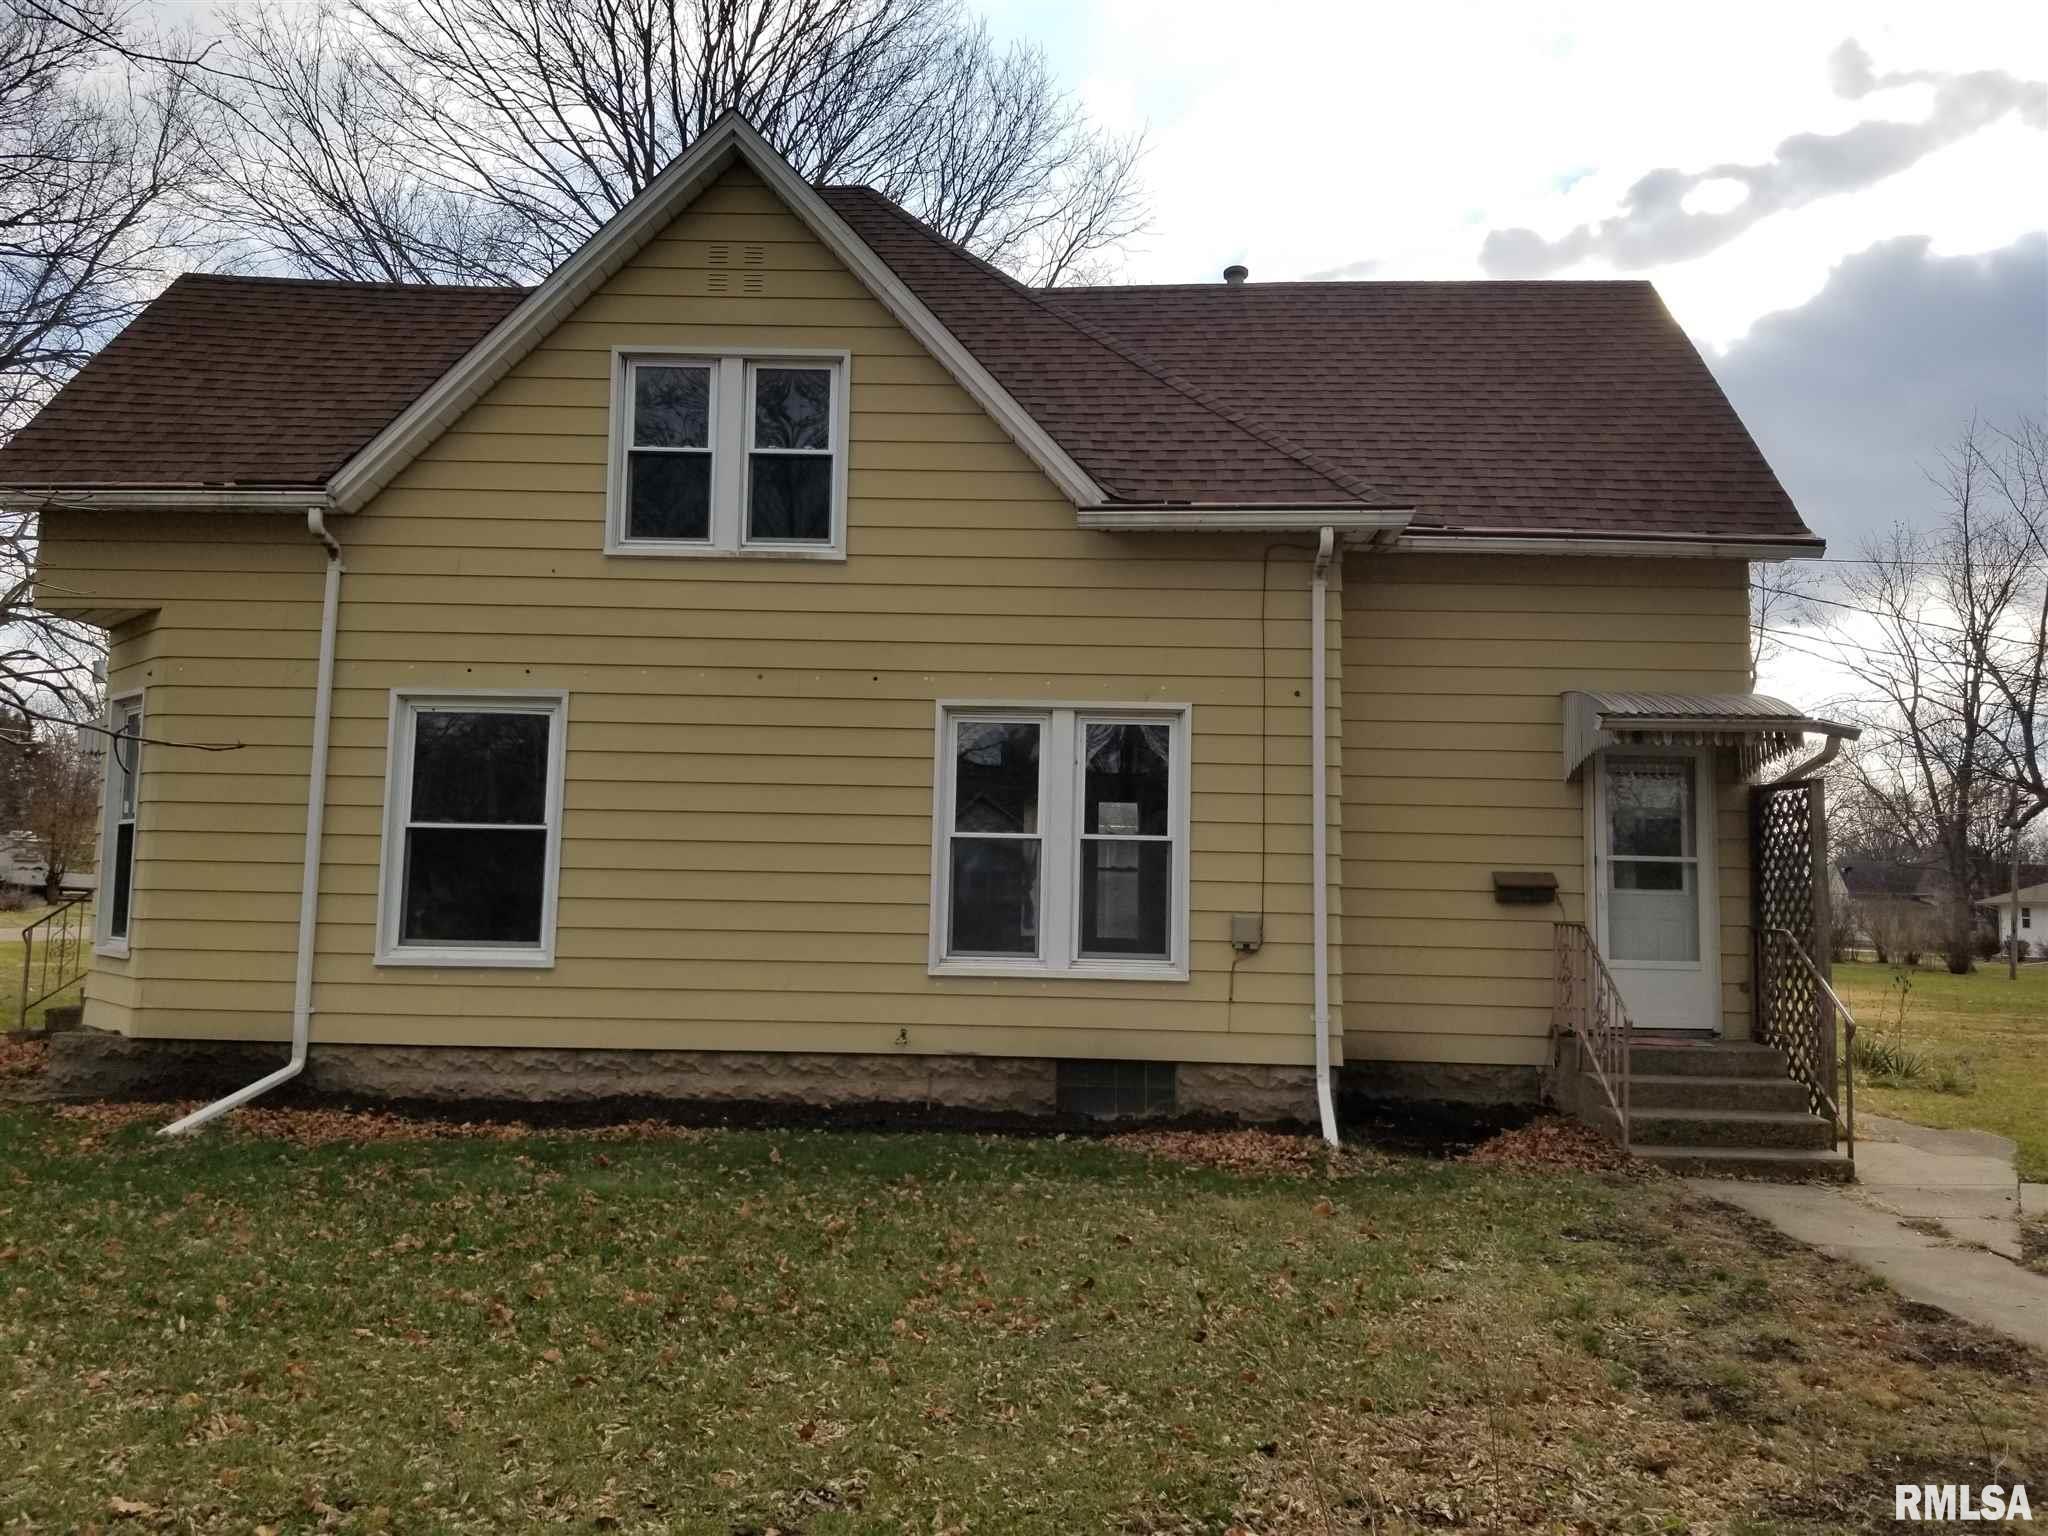 201 S PARK Property Photo - Manito, IL real estate listing